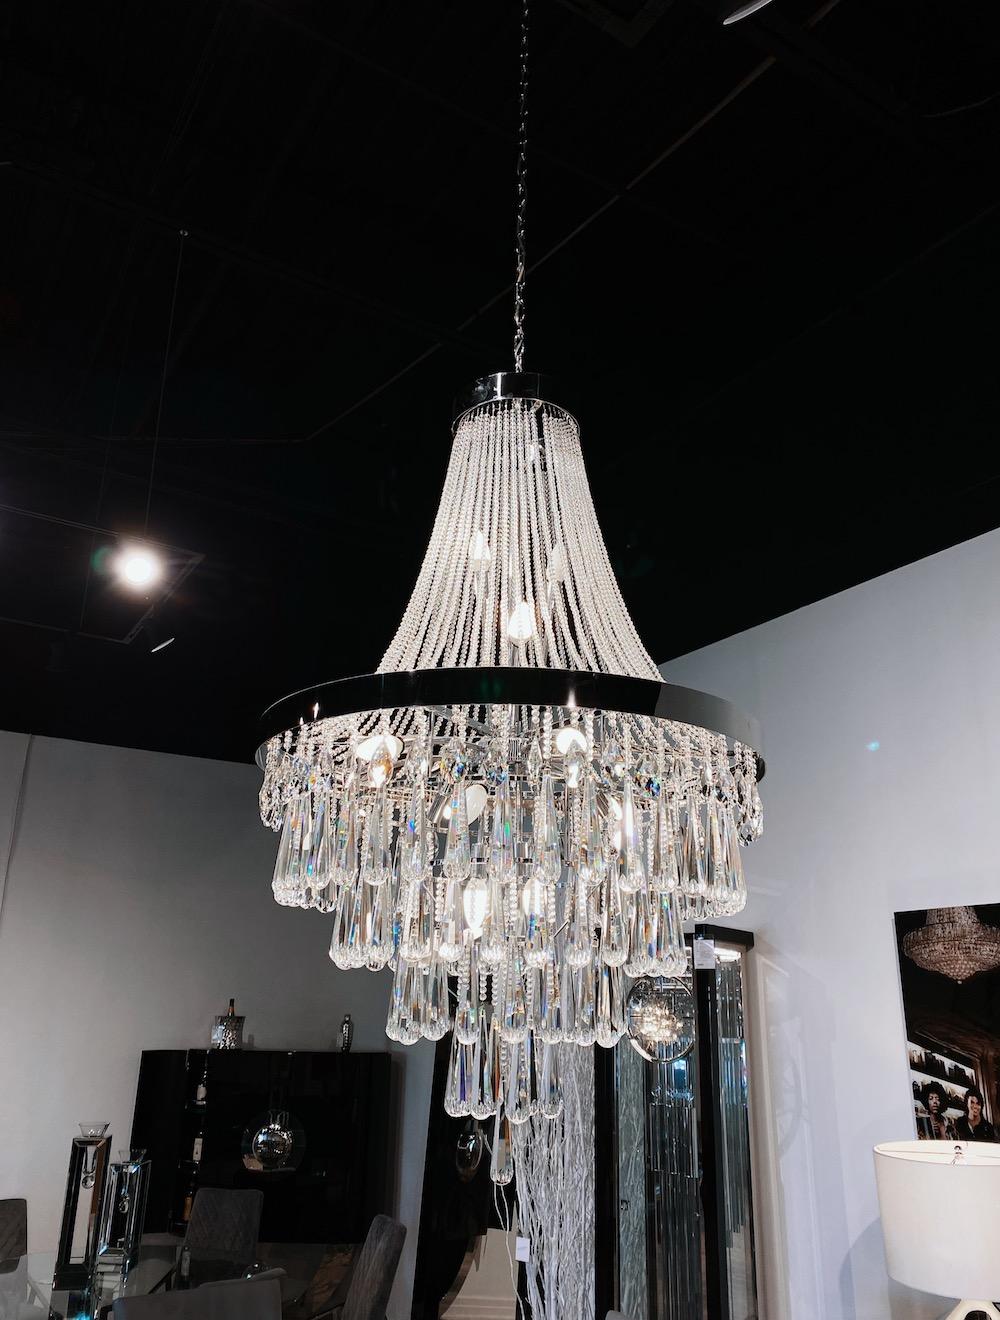 martin daniel interiors Toronto luxury lighting home decor 6